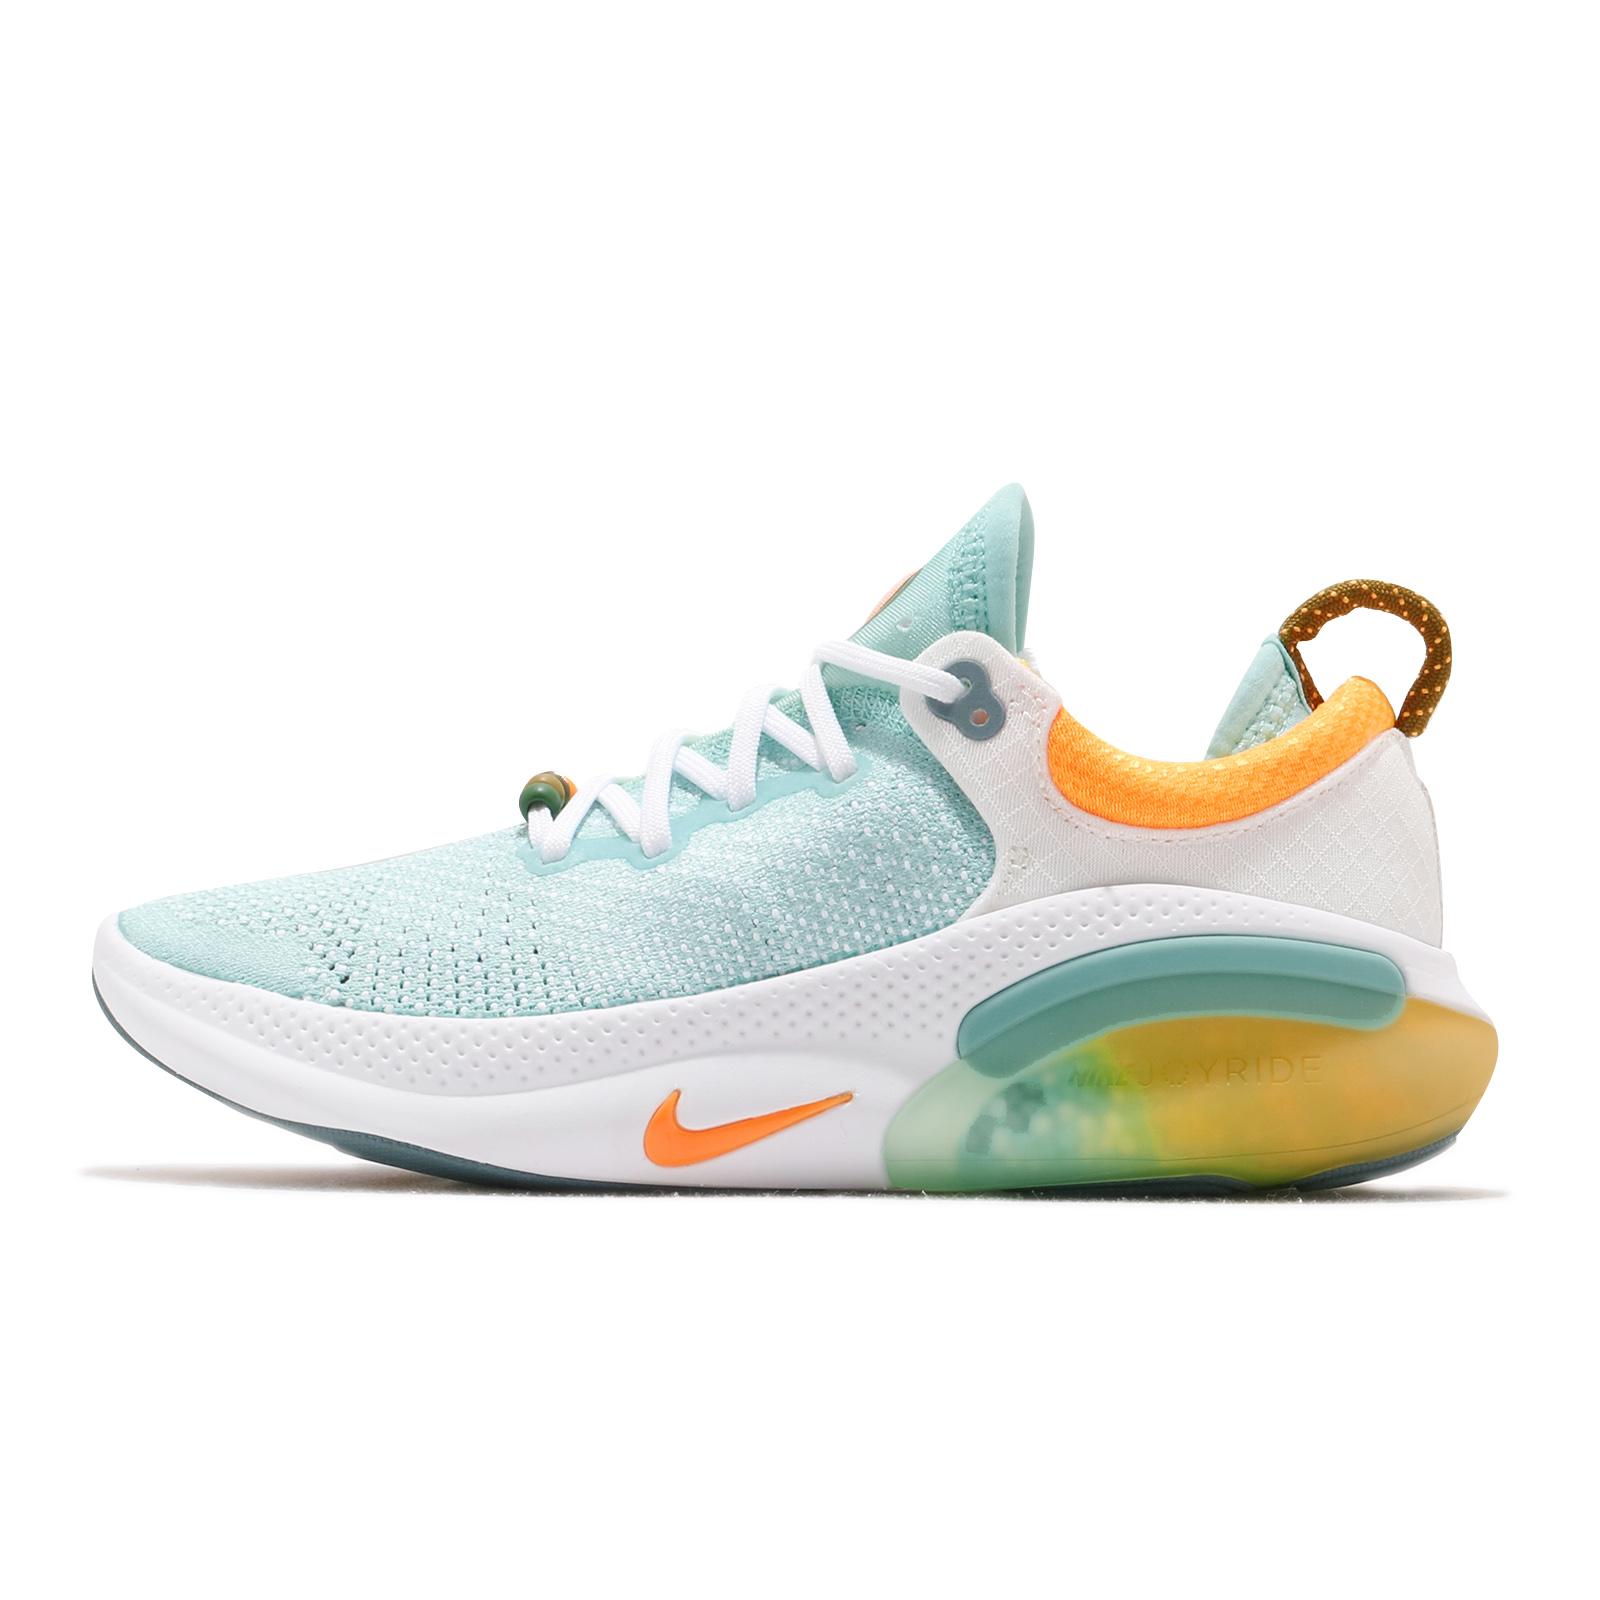 Nike 慢跑鞋 Wmns Joyride Run FK 藍 橘 女鞋 運動鞋 蝴蝶【ACS】 DA1844-481